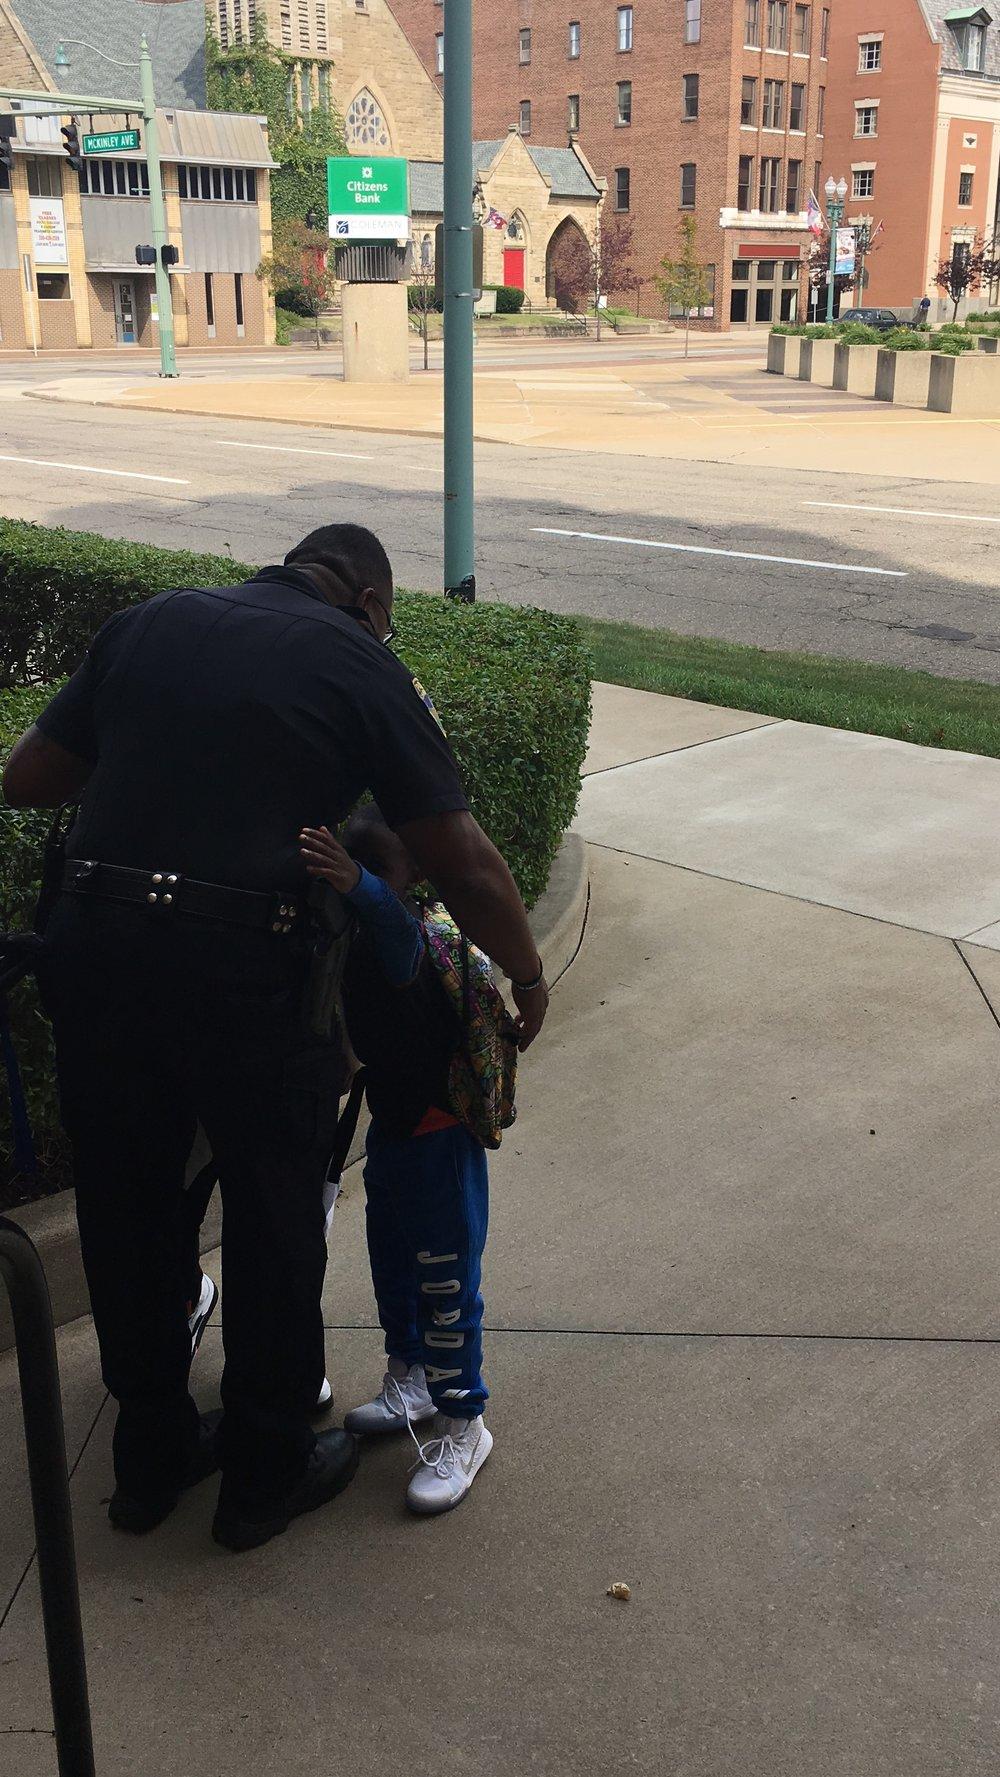 Officer Sharpe Welcoming Kids